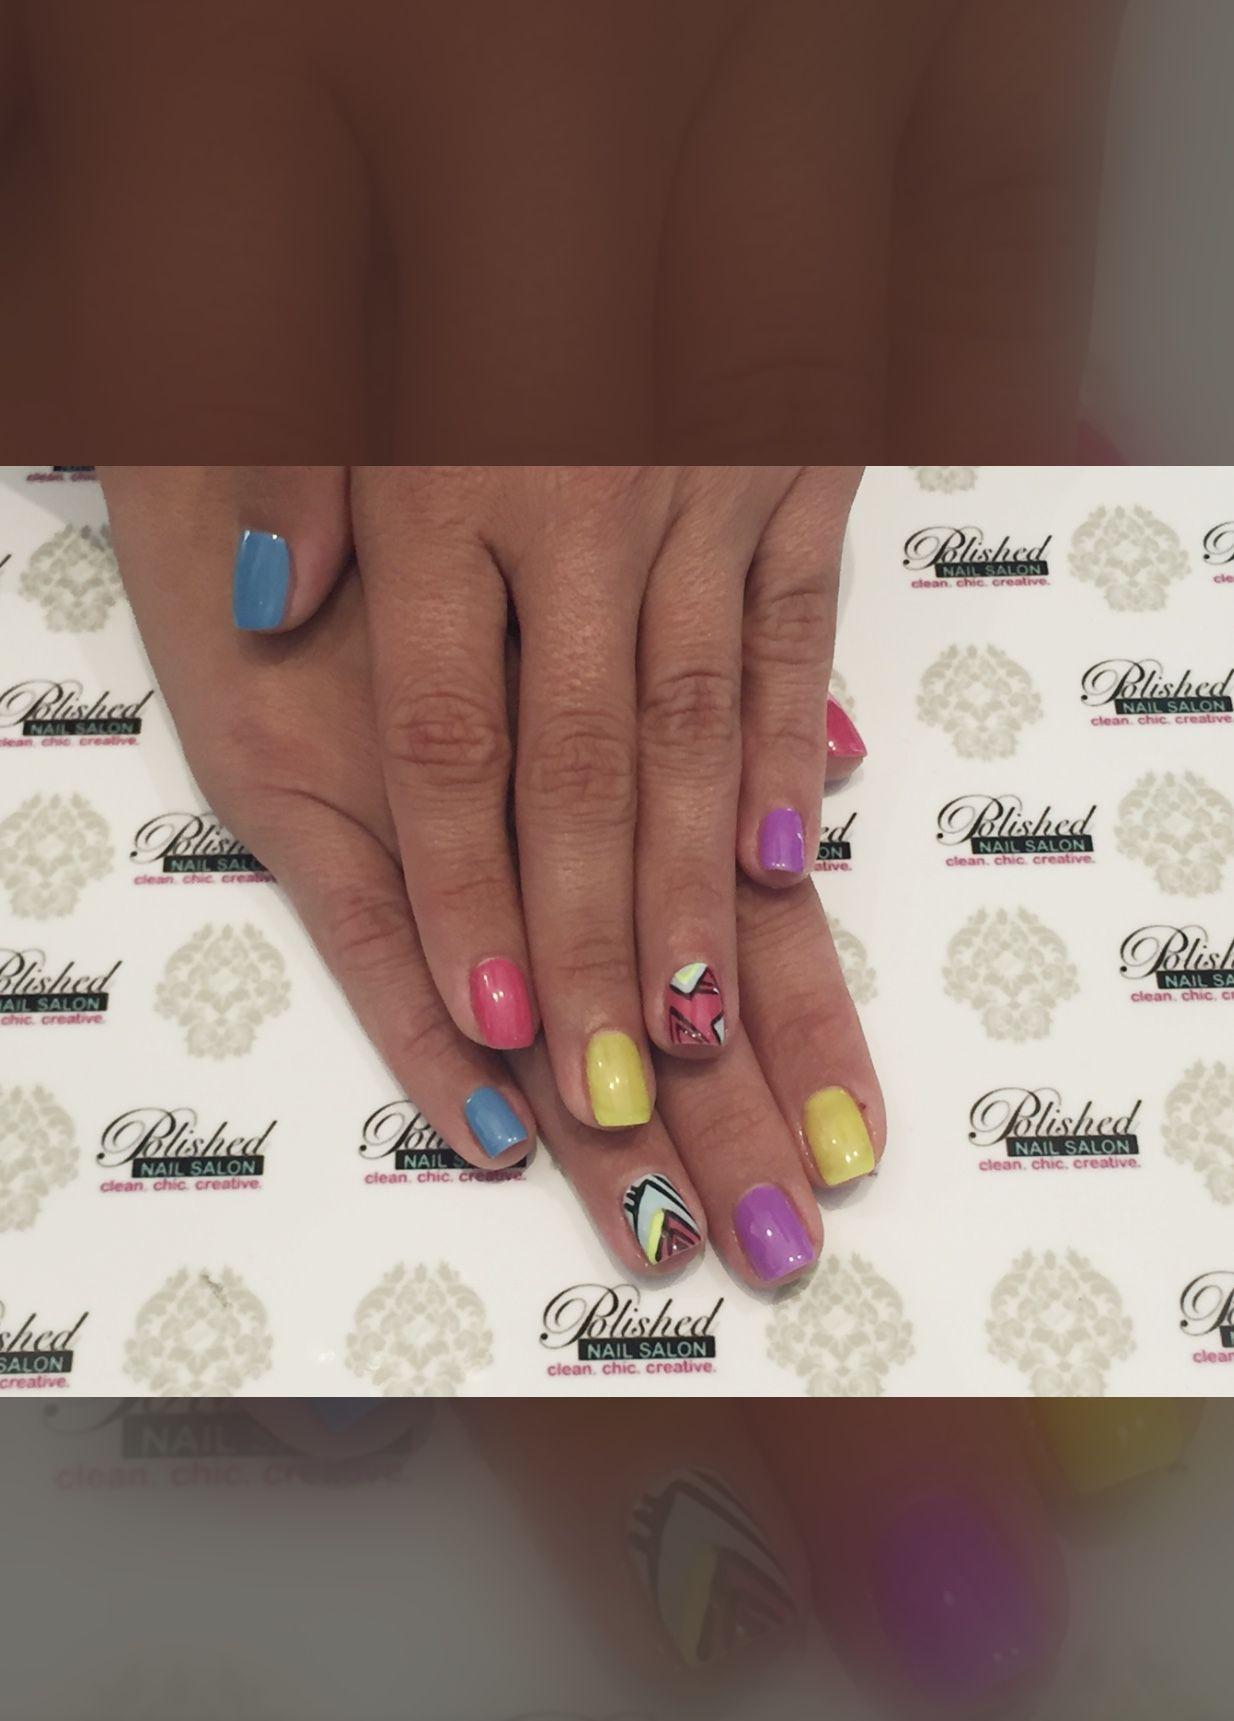 Pin by Polished Nail Salon on Summer Nails | Pinterest